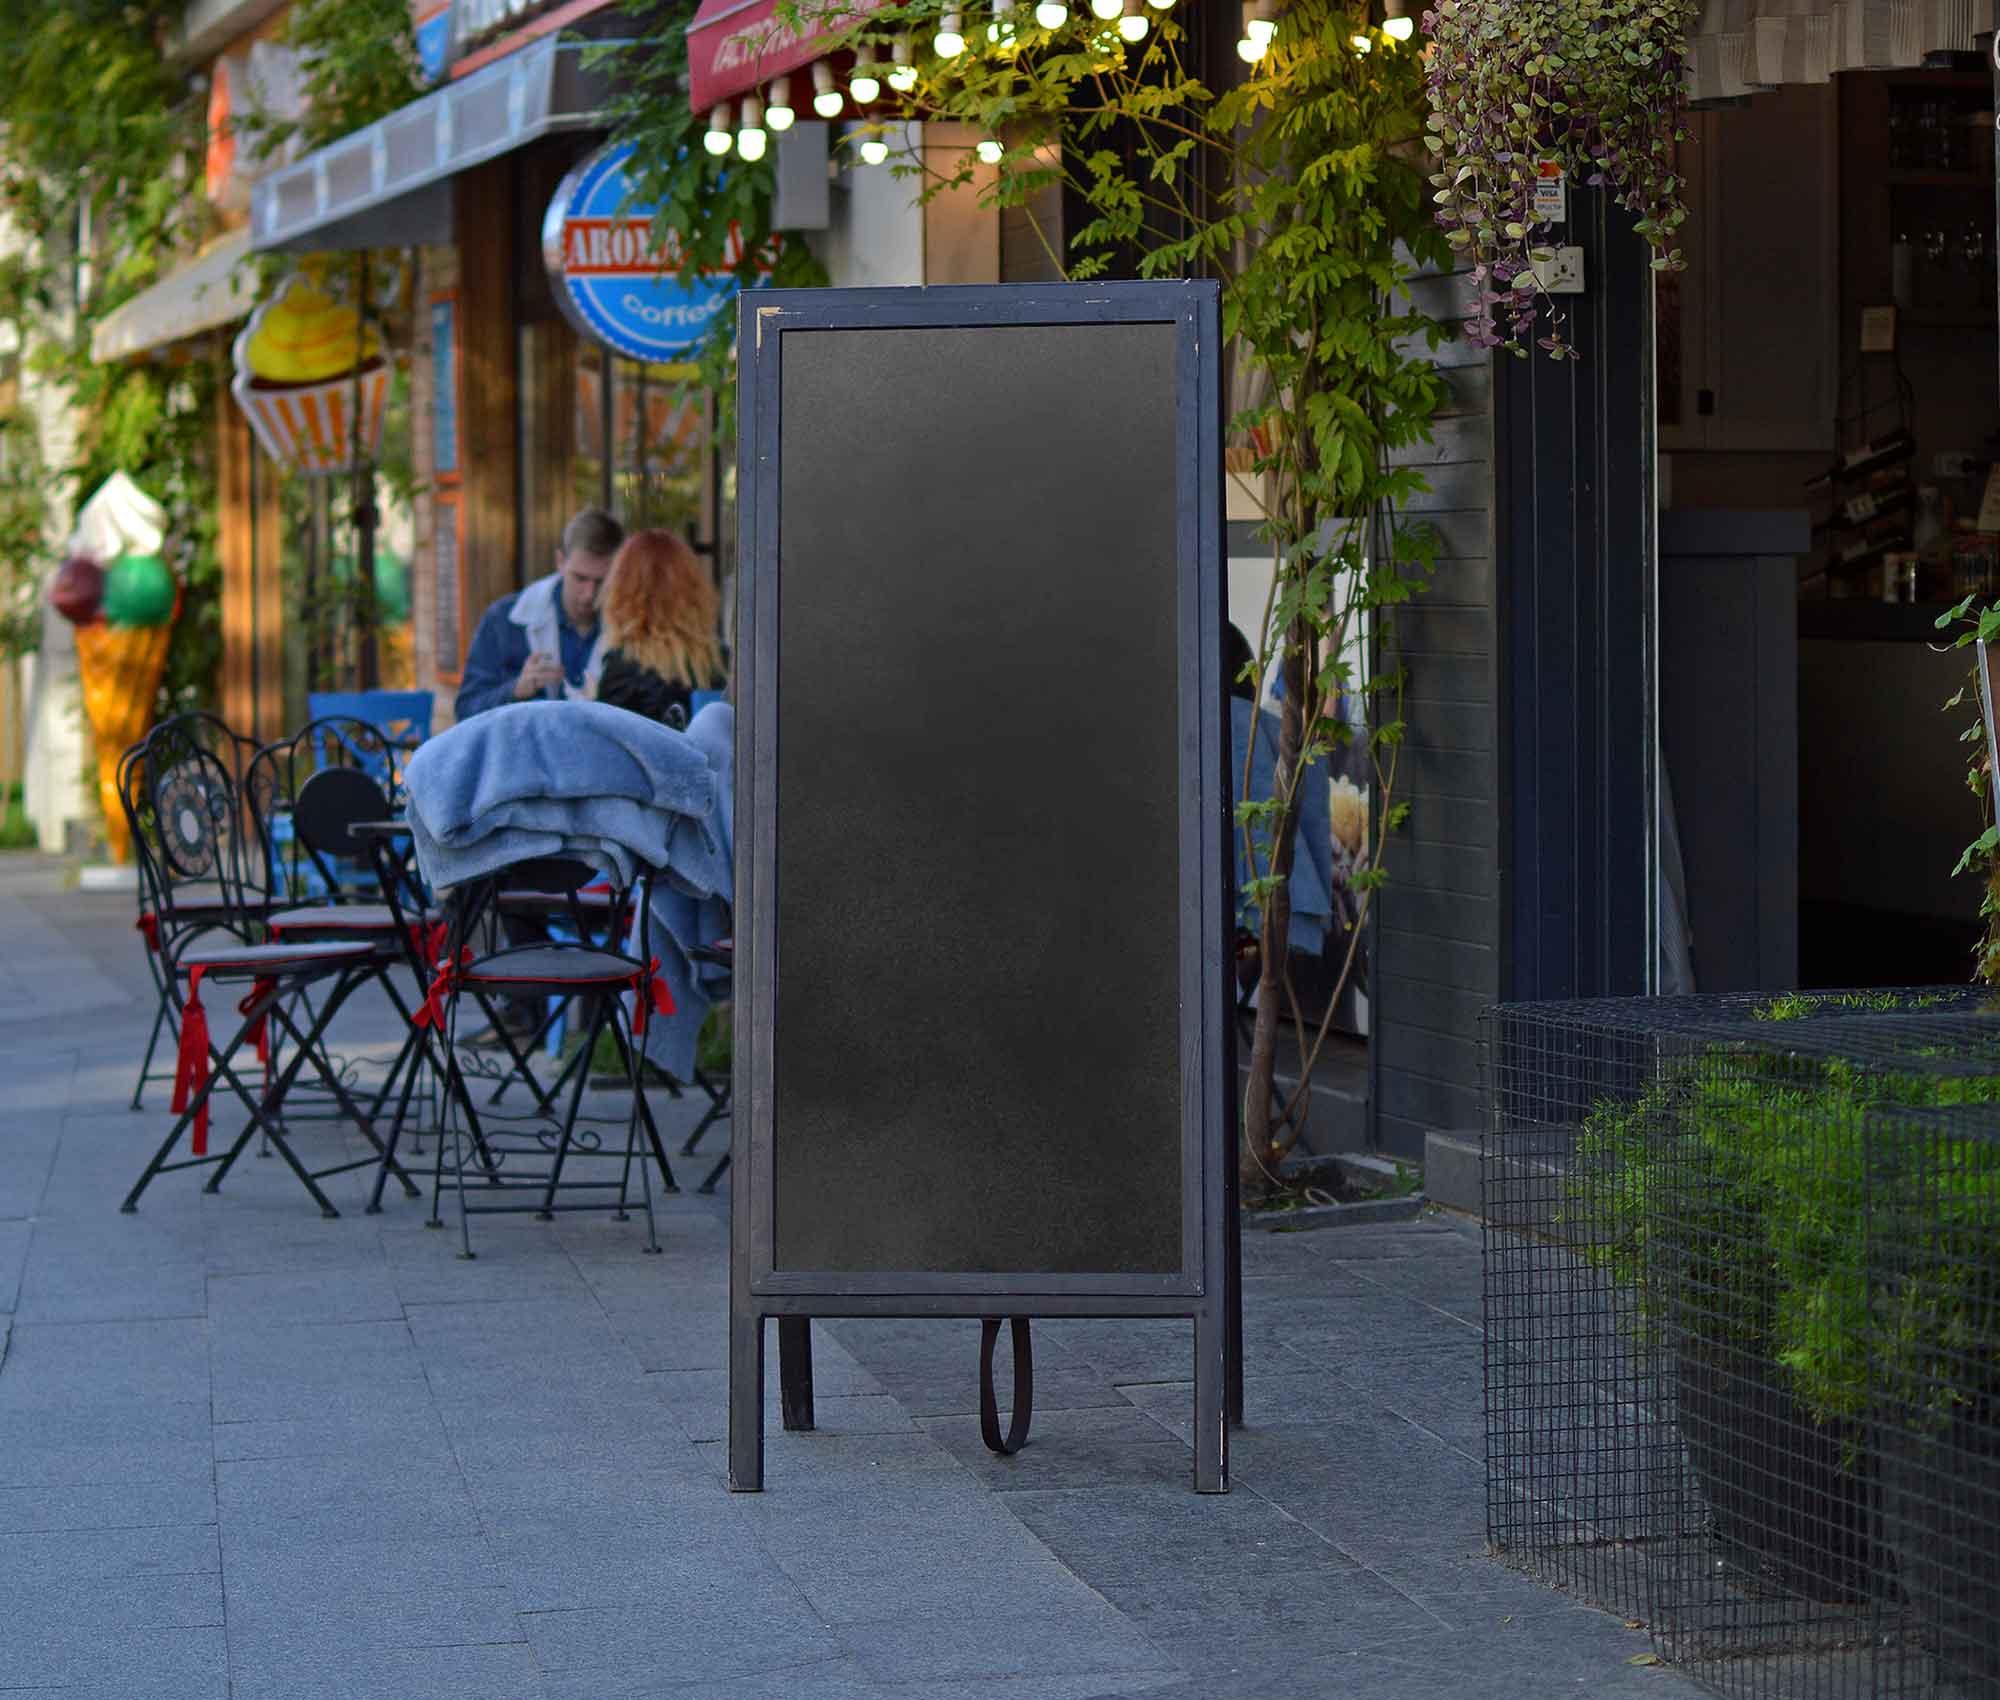 Outdoor Restaurant Menu Stand Board Mockup 2